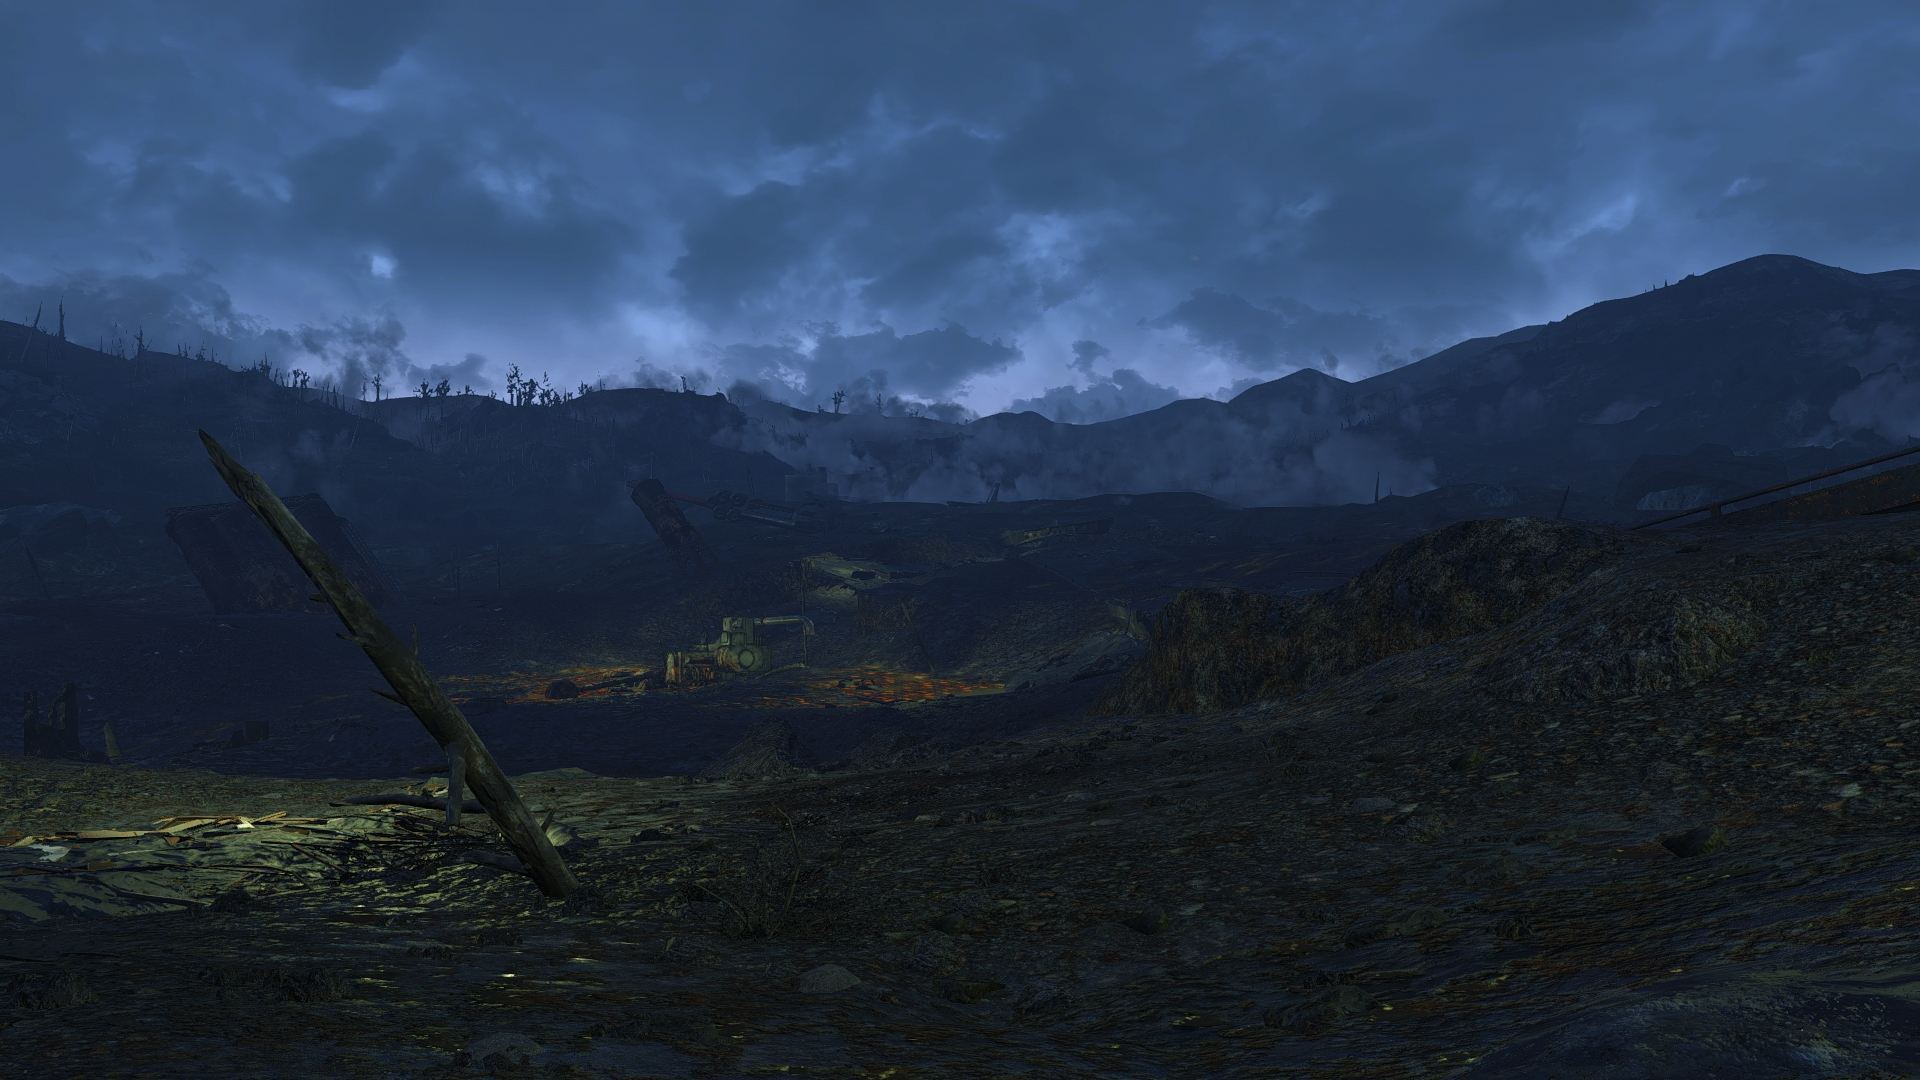 000755.Jpg - Fallout 4